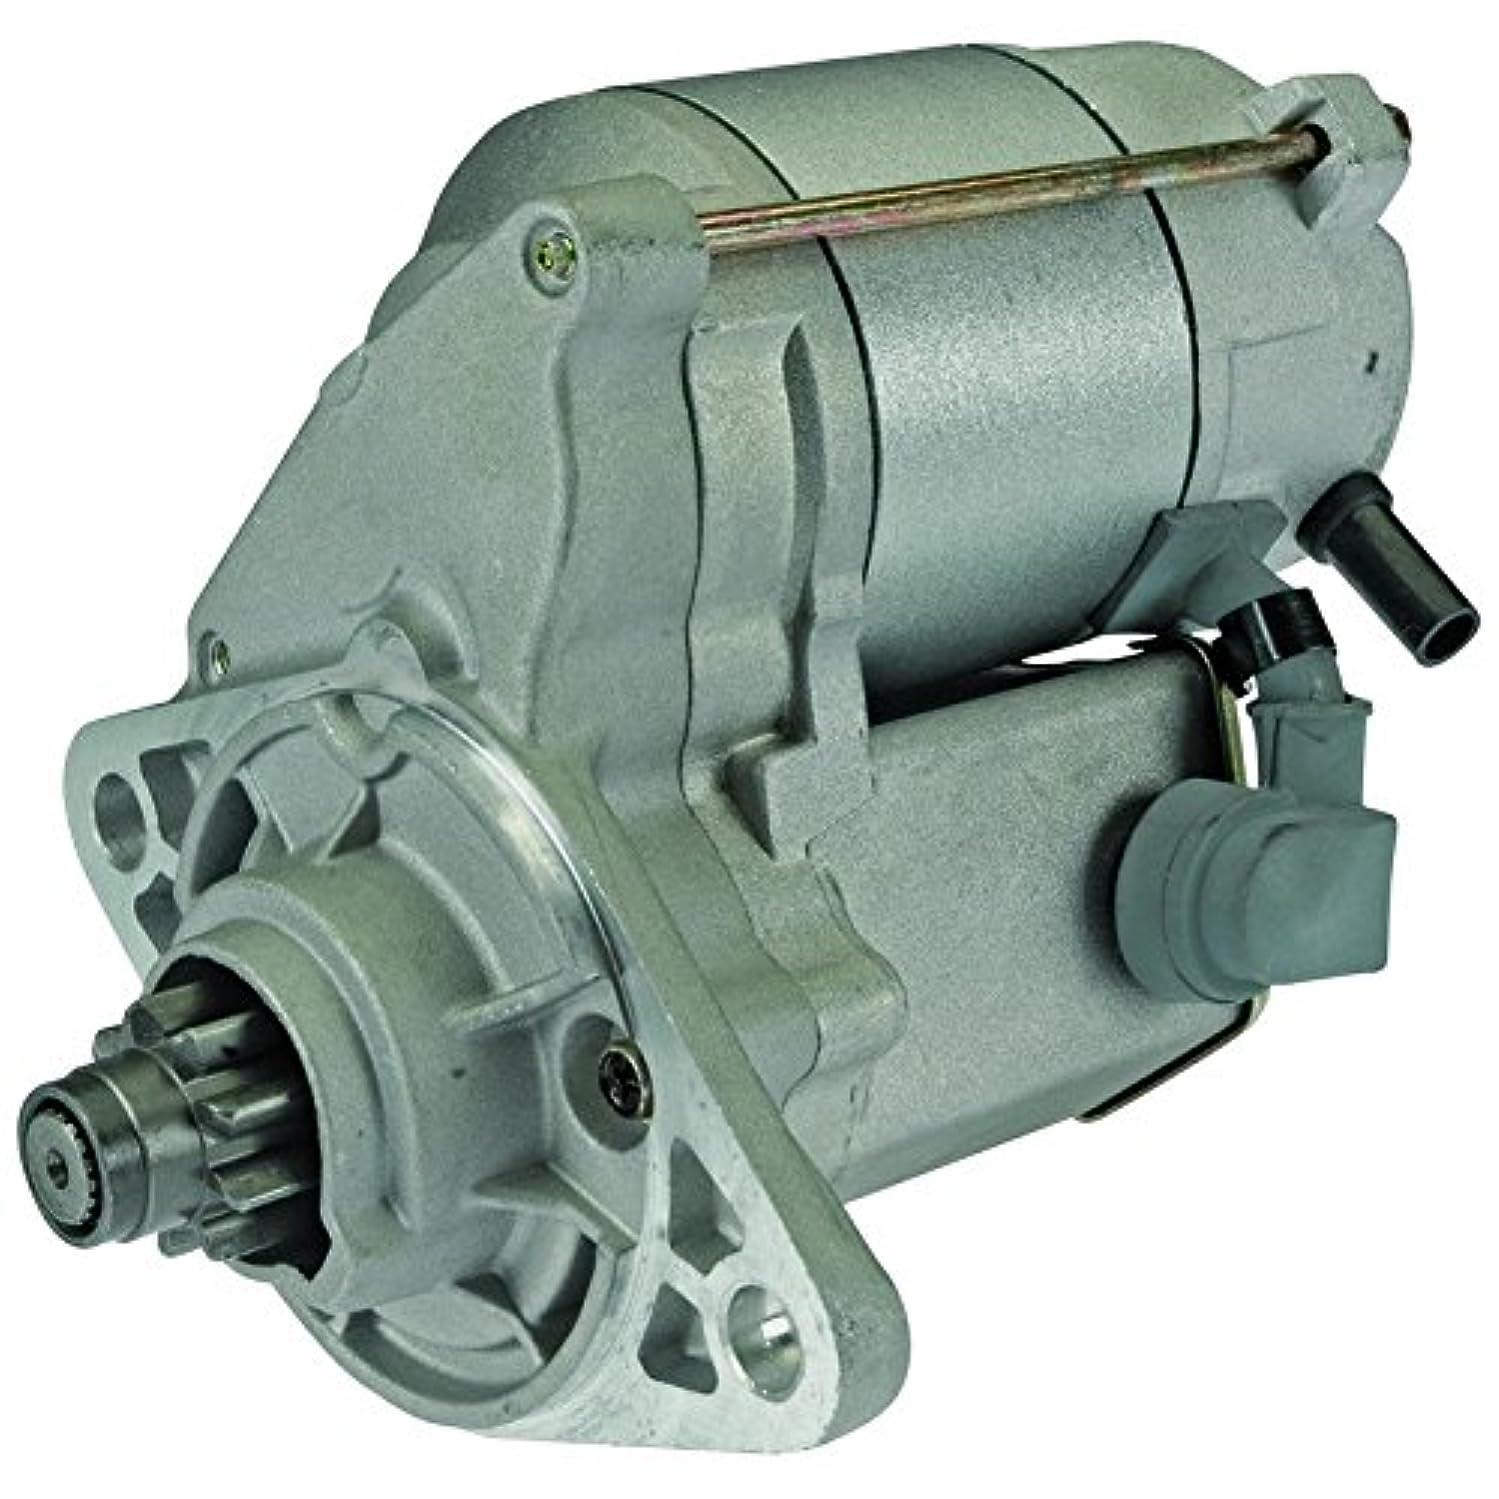 Premier Gear PG-17242 Professional Grade New Starter